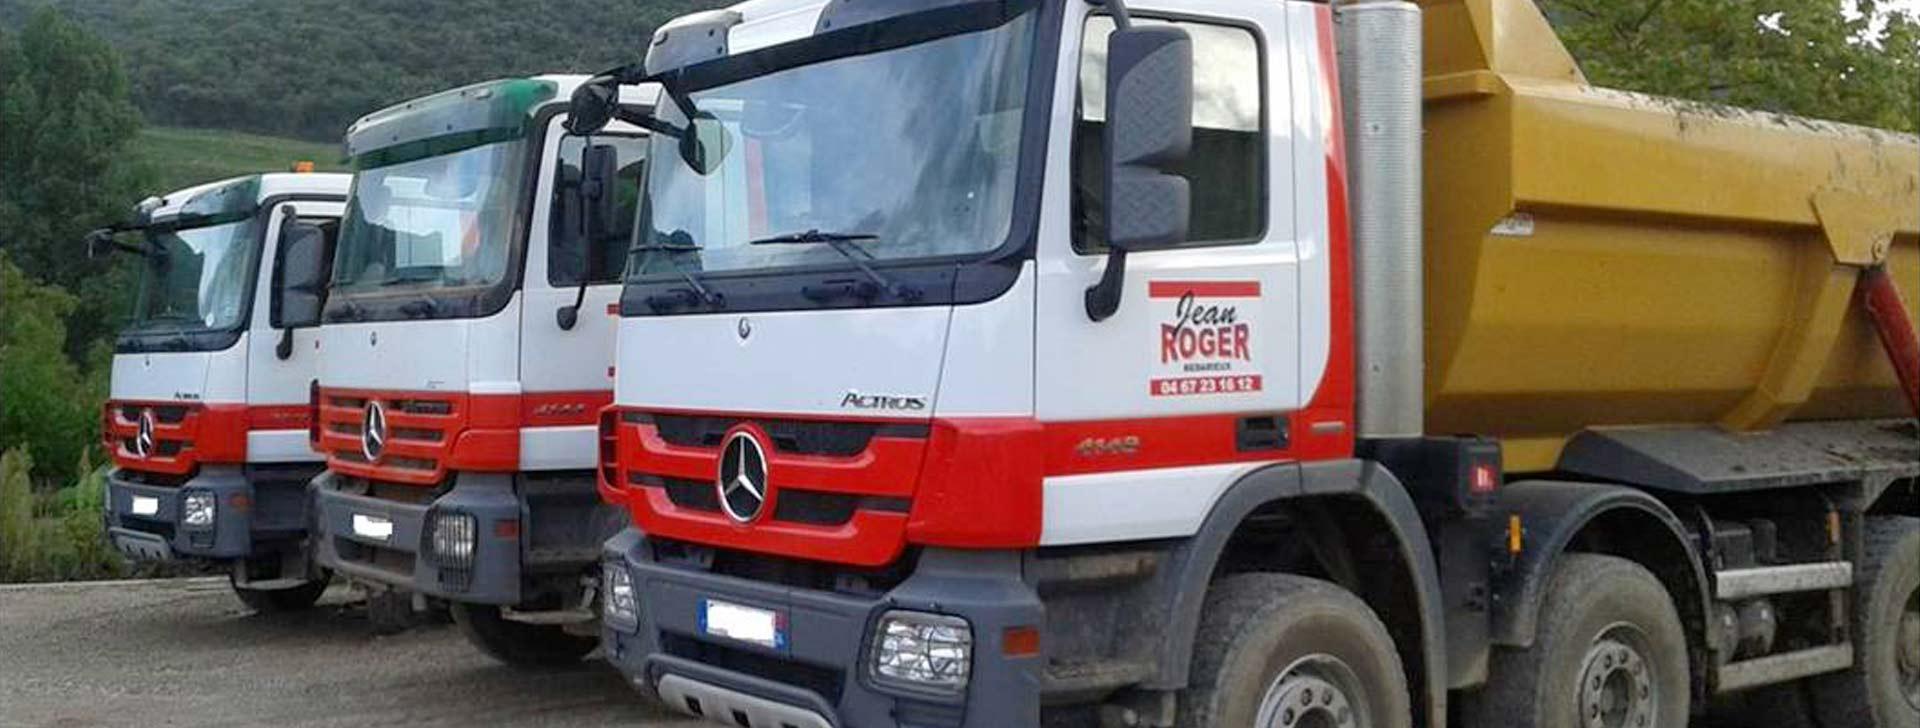 Flotte de véhicules adaptée,  VRD, assainissement...